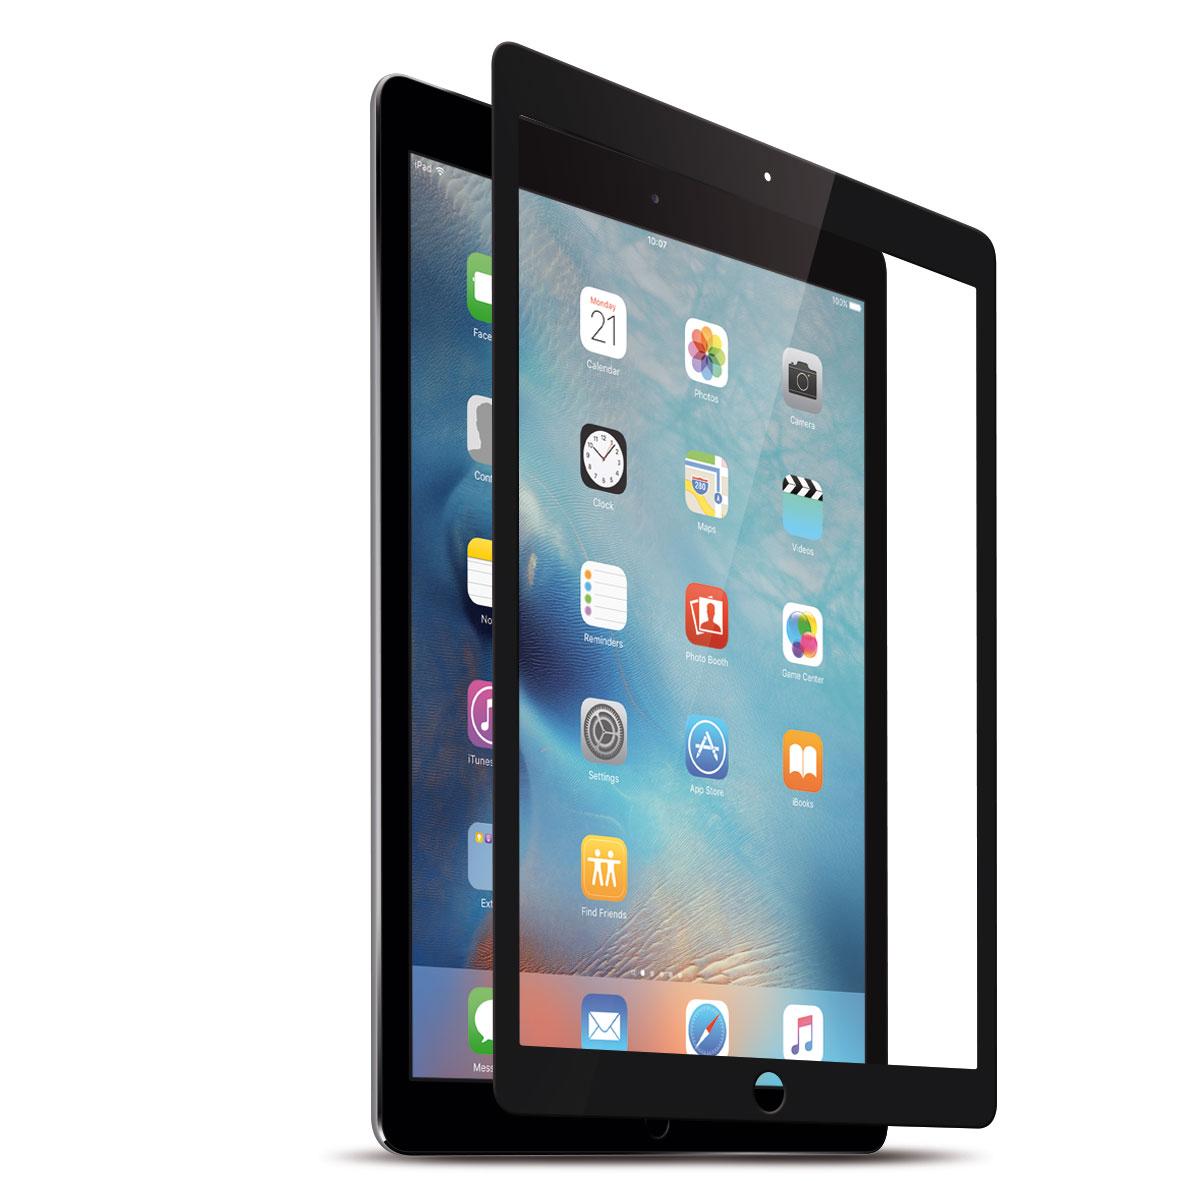 KMP Protective Glass Schutzfolie für iPad Mini 4, schwarz